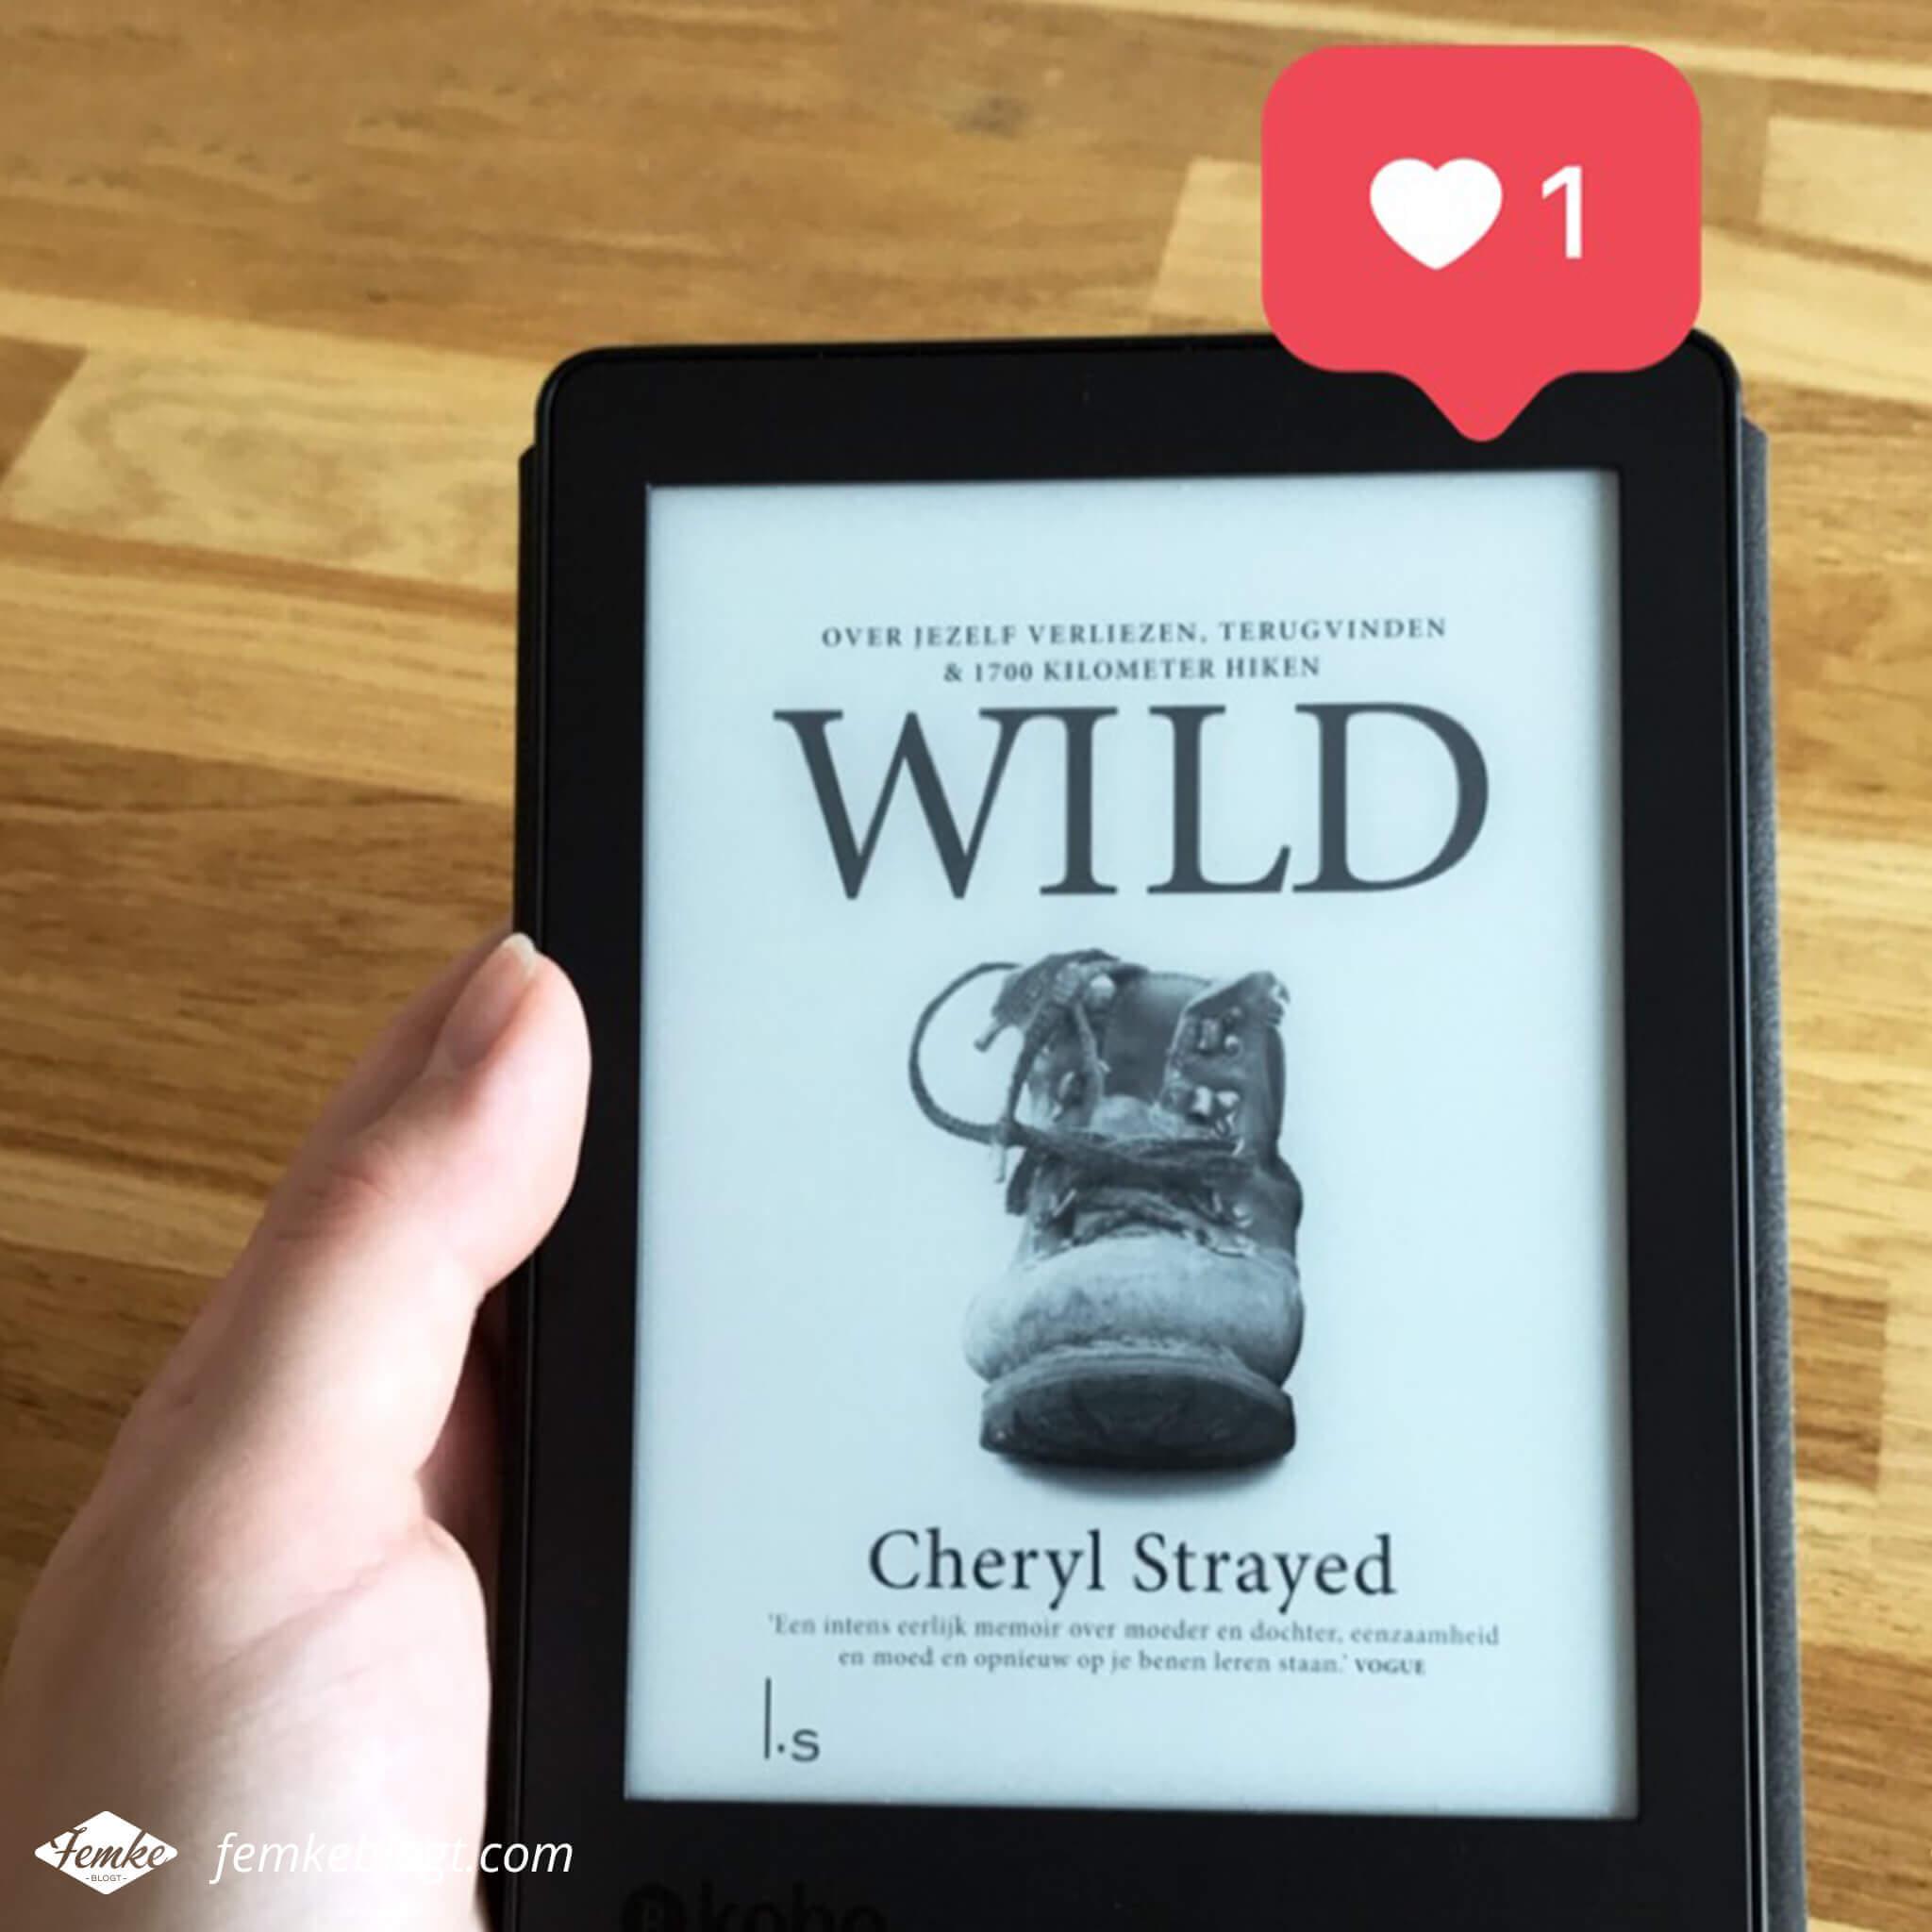 Maandoverzicht november | Wild, Cheryl Strayed